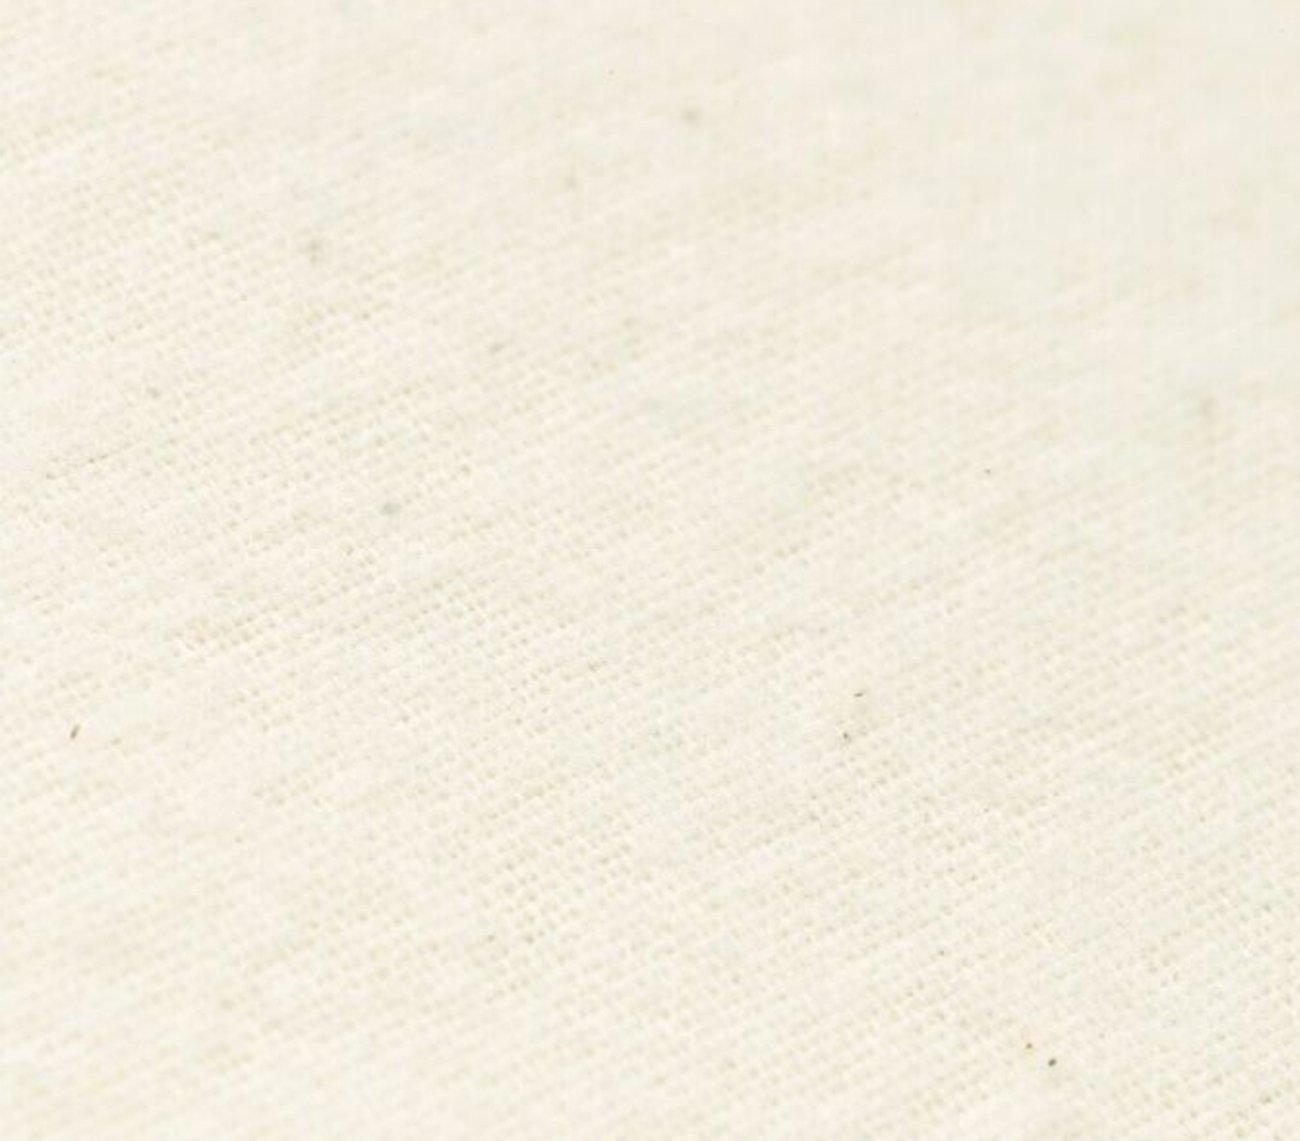 70 x 140 cm Naturalmat Organic Cotton Cot Bed Bedding Set